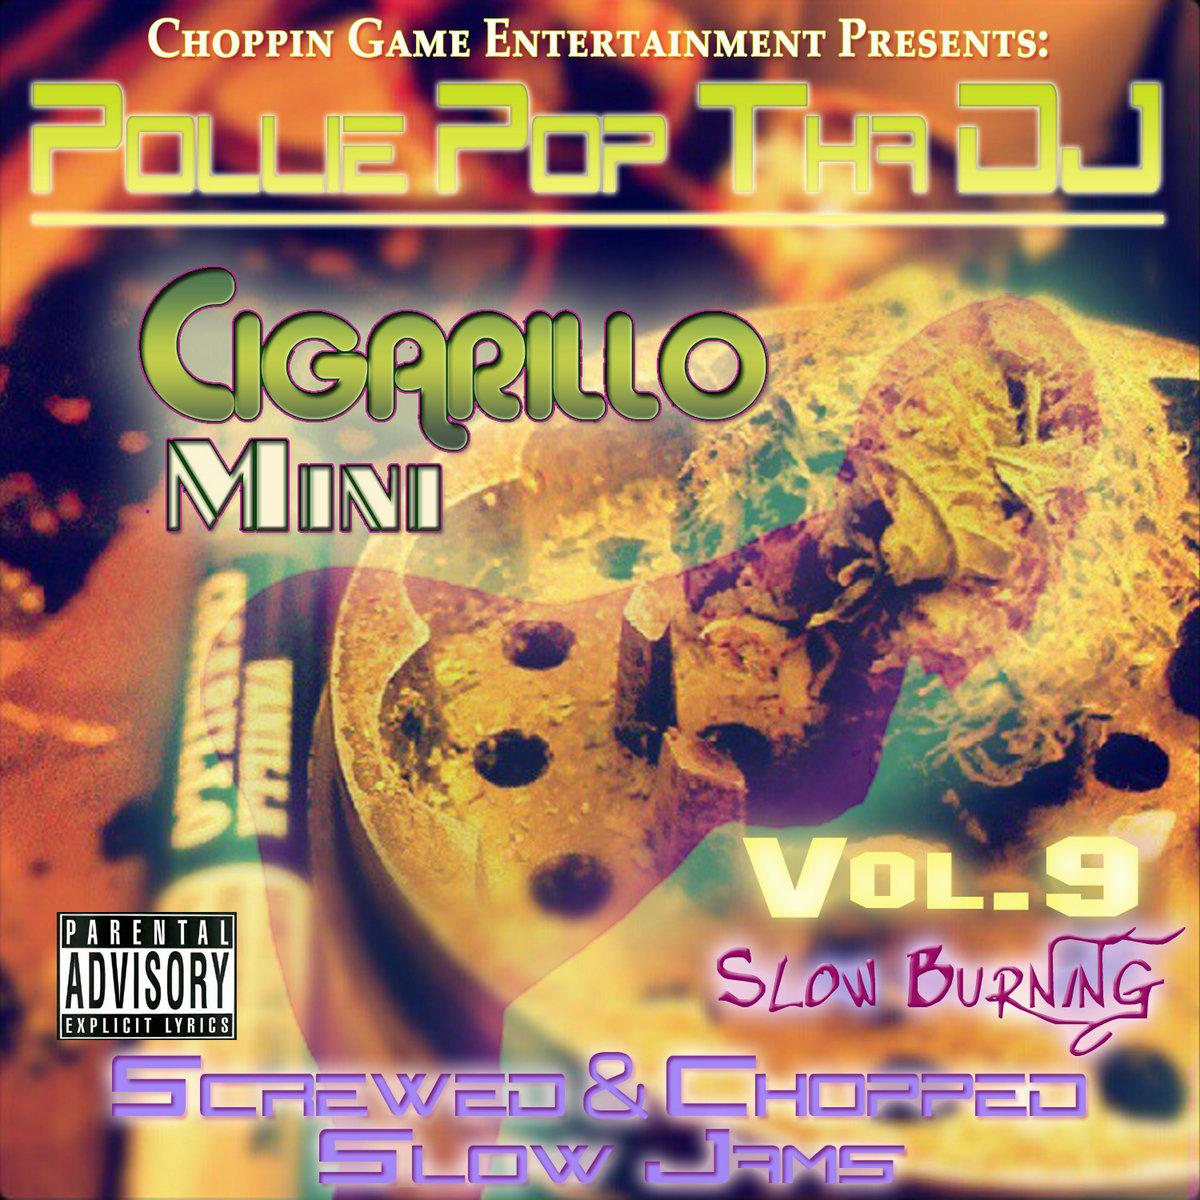 Cigarillo Mini vol  9 (Slow Burning) (Screwed & Chopped Slow